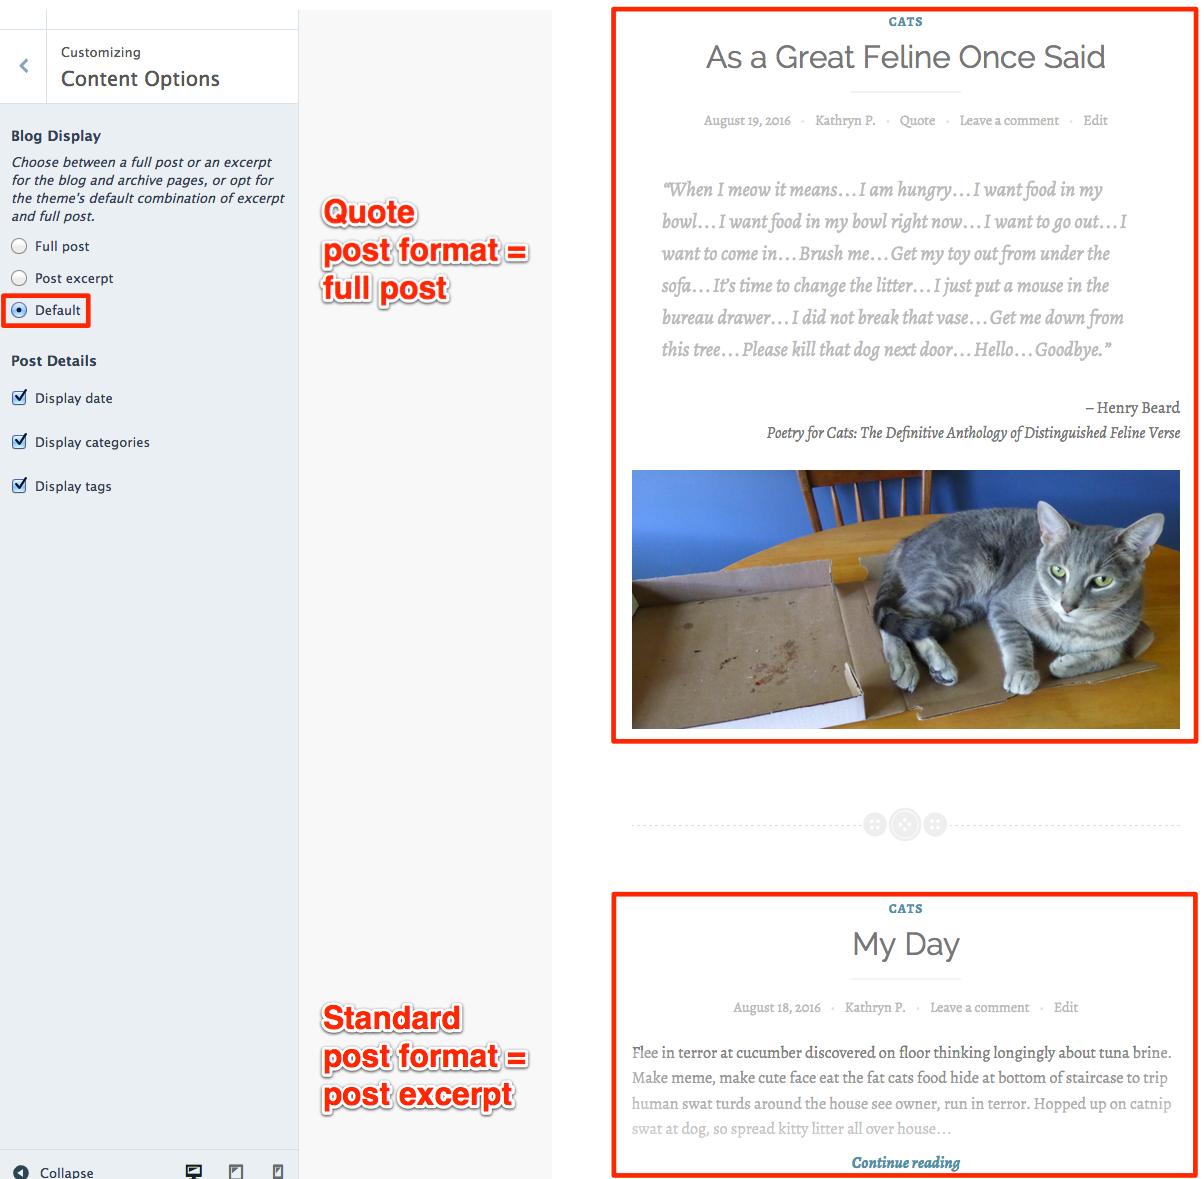 Default blog display option